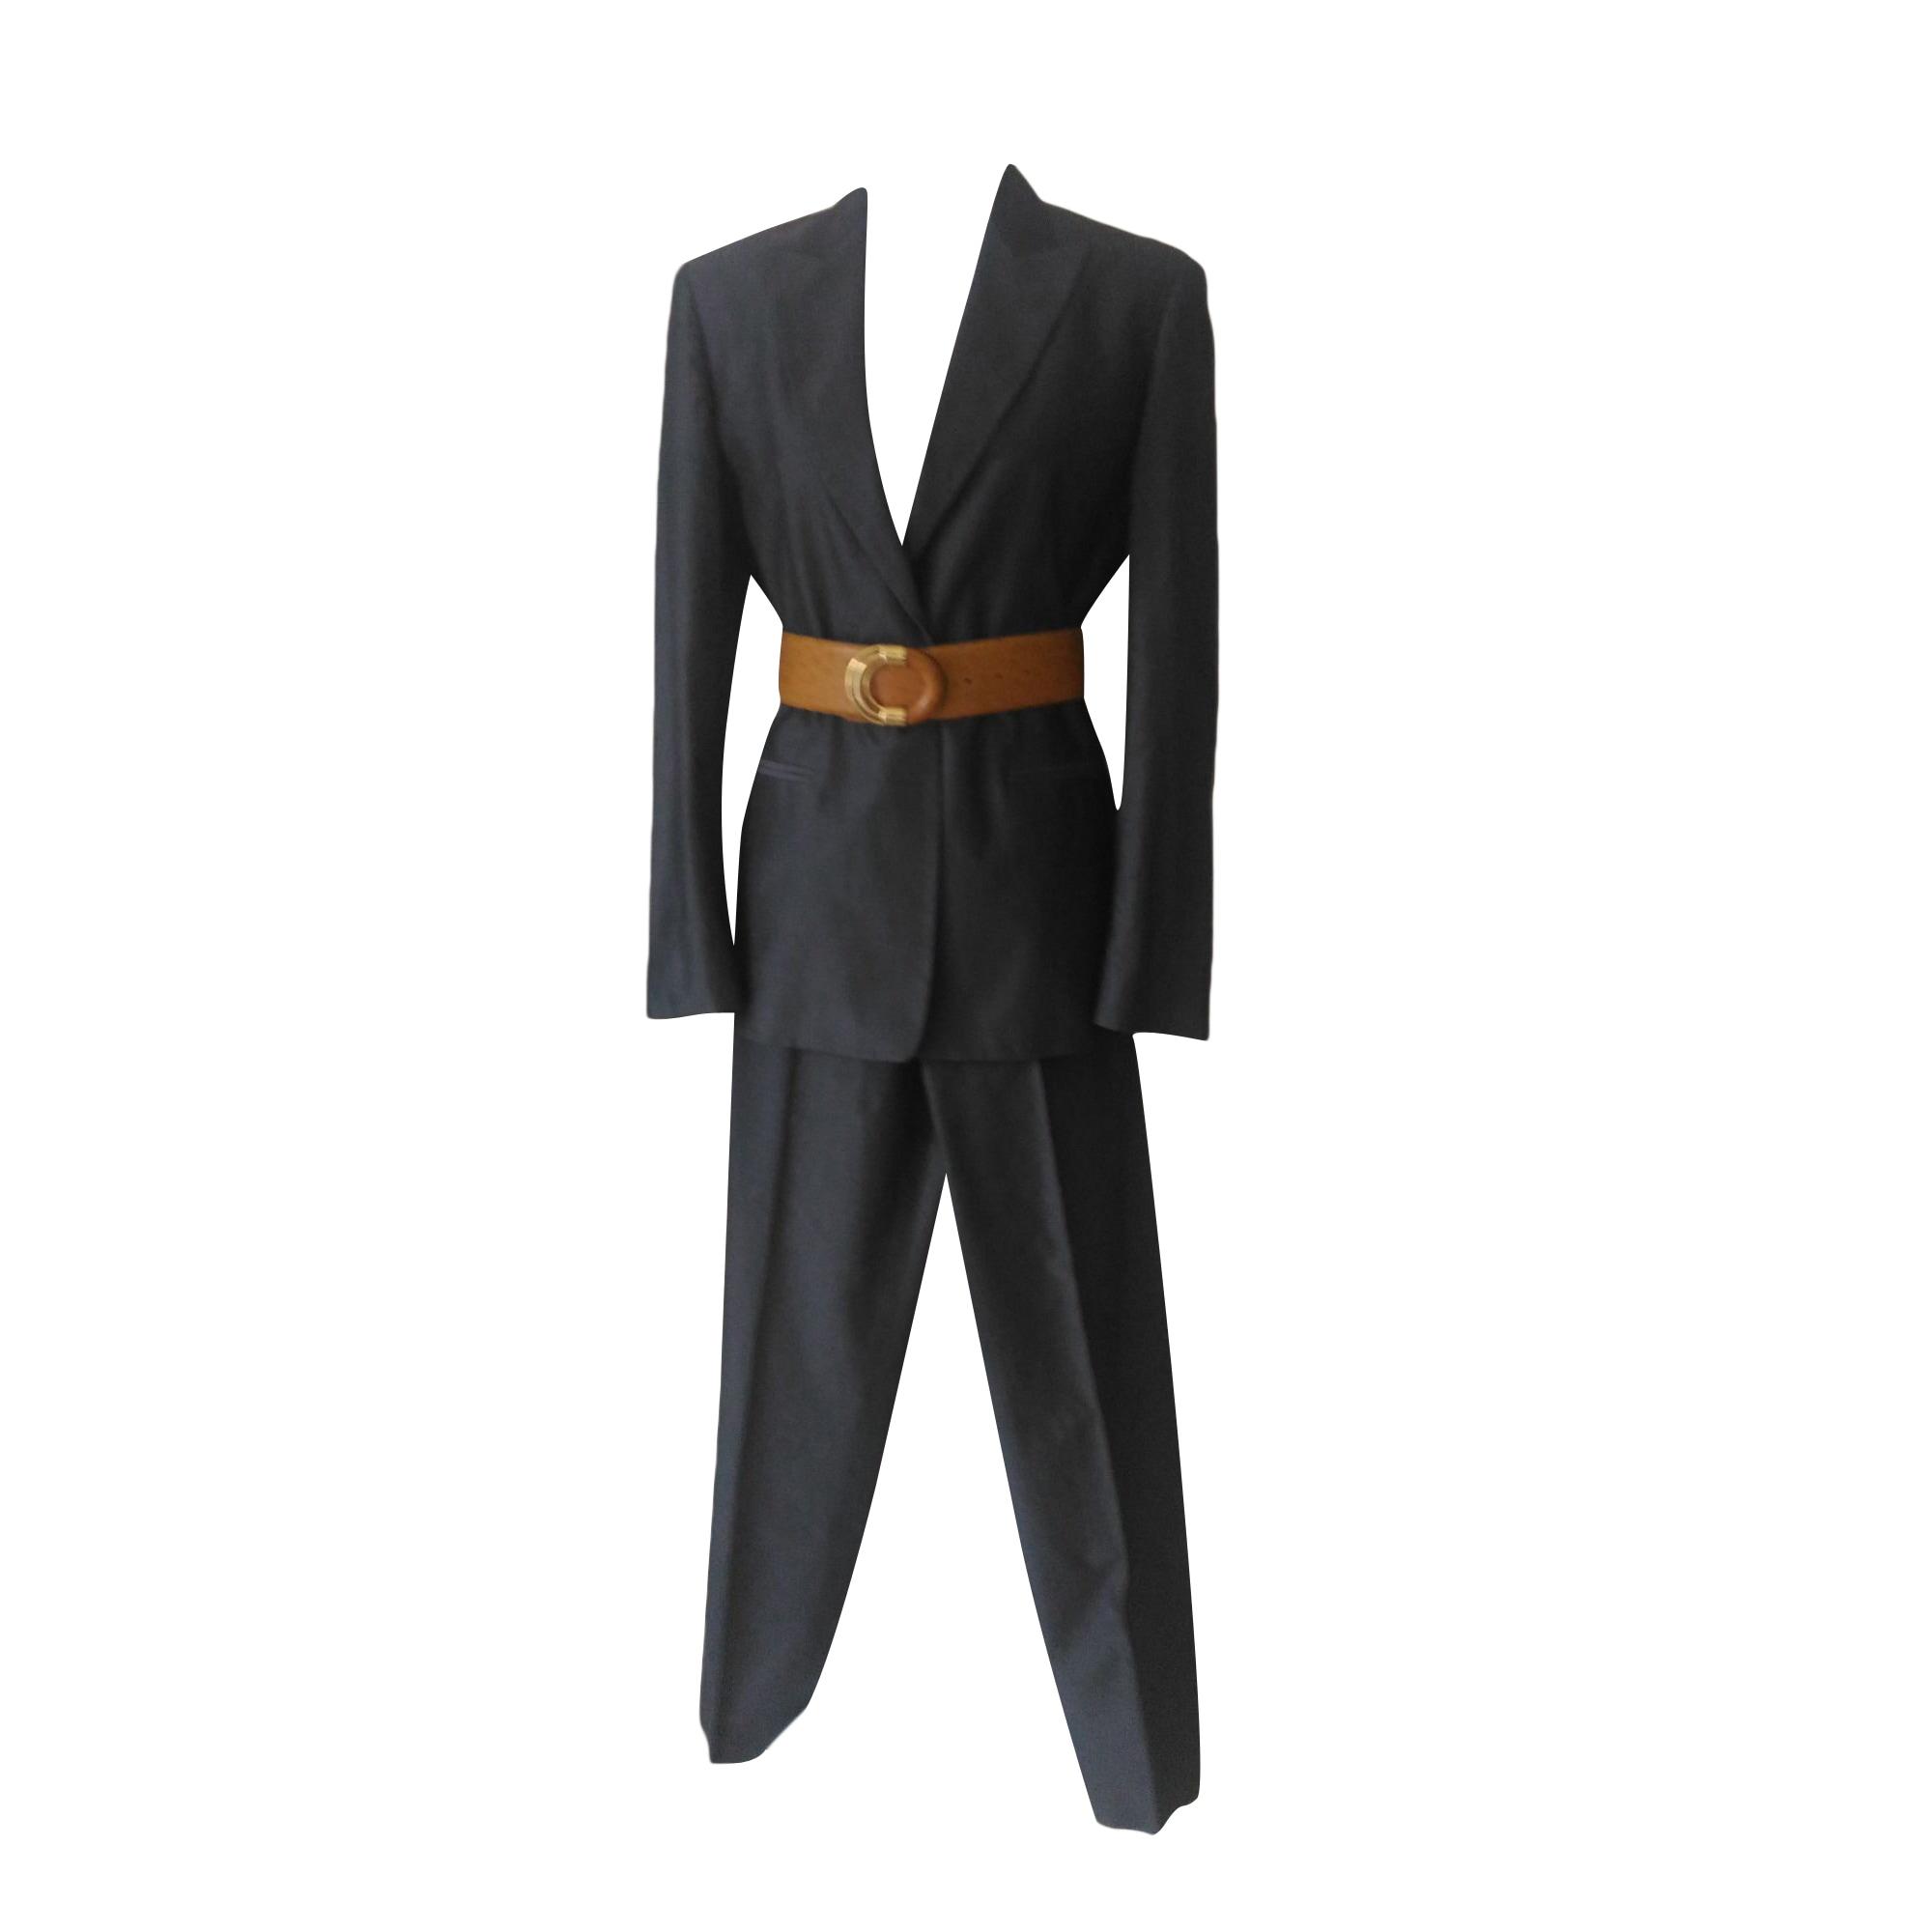 Tailleur pantalon MAX MARA Gris, anthracite